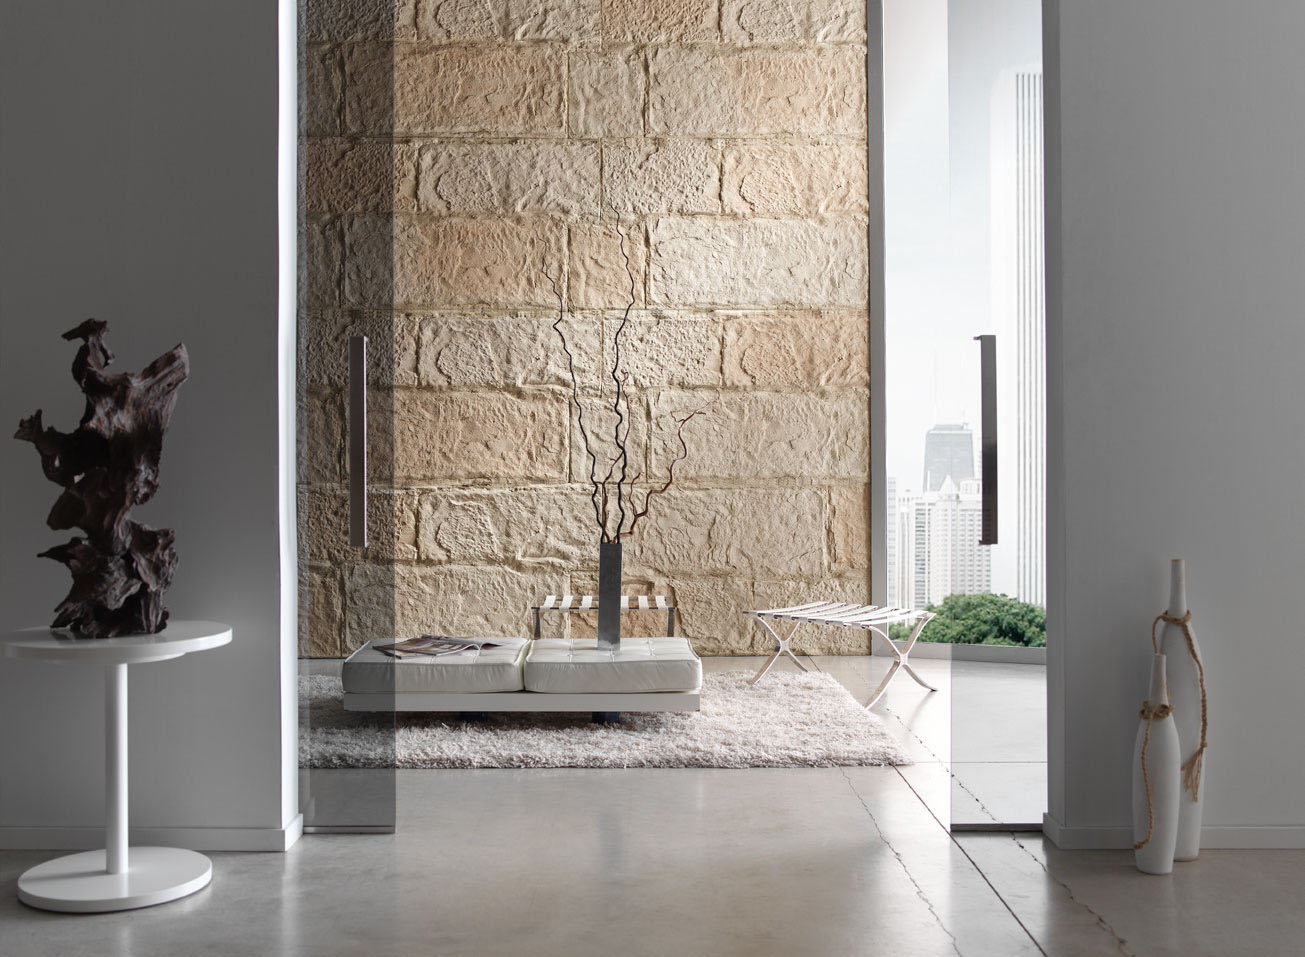 Xpanel piedra 170 sillar viejo ocre 3845 panel piedra - Paneles para forrar paredes ...